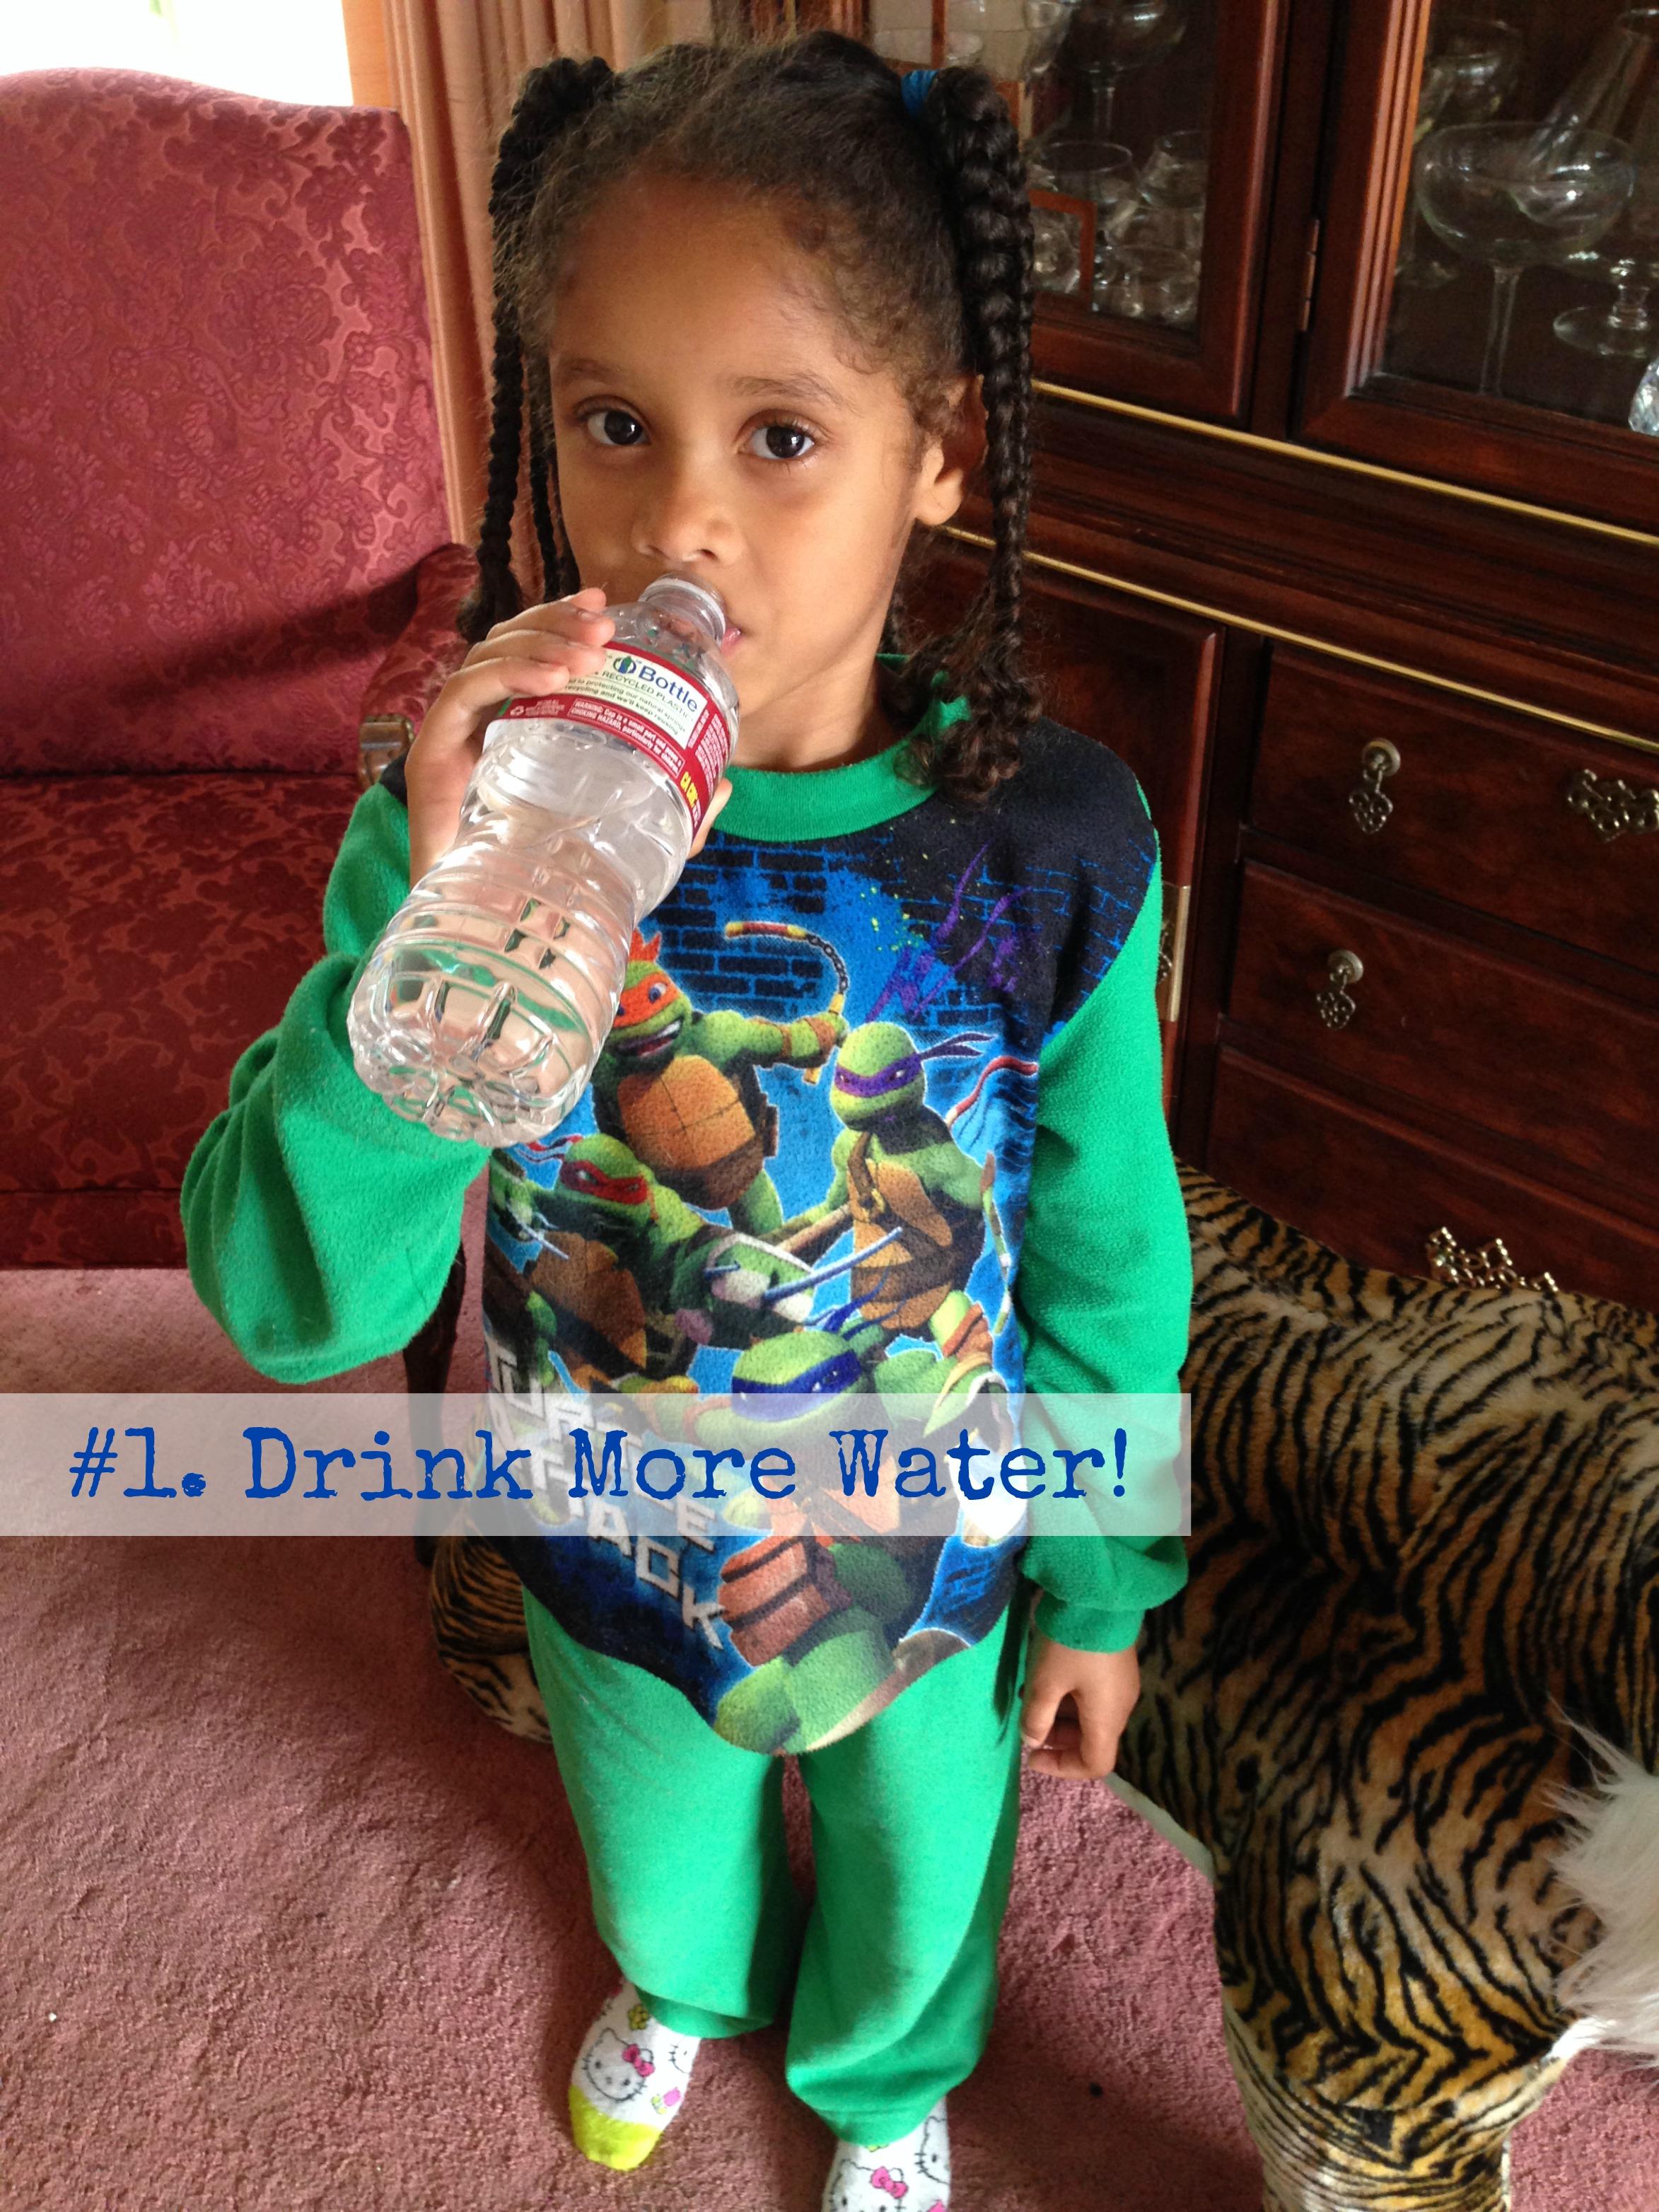 Doctor Recommended, #NaturalProbiotic, #shop, #cbias, ClassyBlackGirl.com, Water